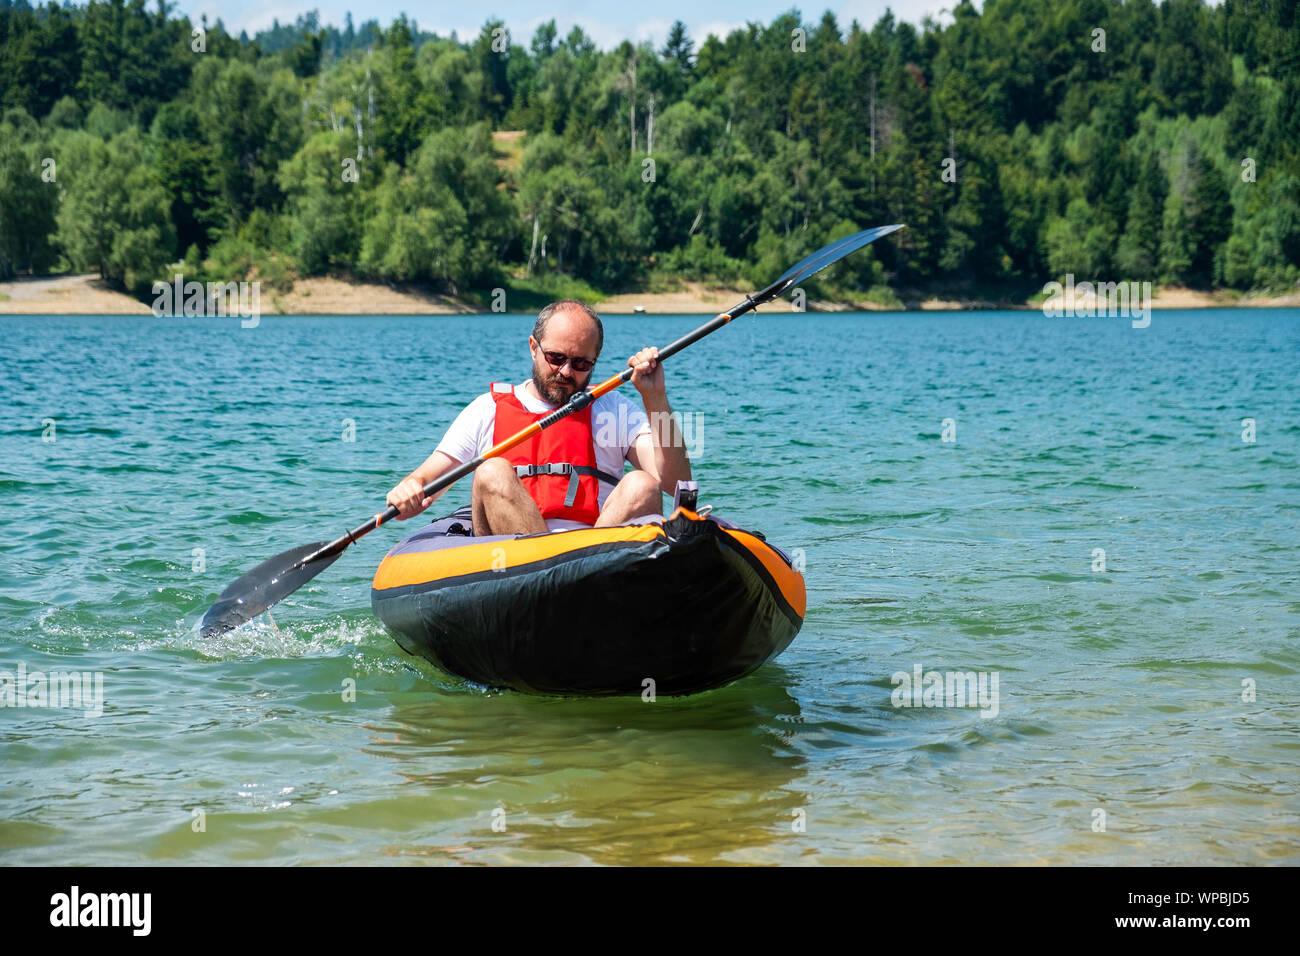 Man paddling in inflatable kayak on lake Lokve, in Gorski kotar, Croatia. Adventurous kayaking experience in a beautiful nature. Stock Photo